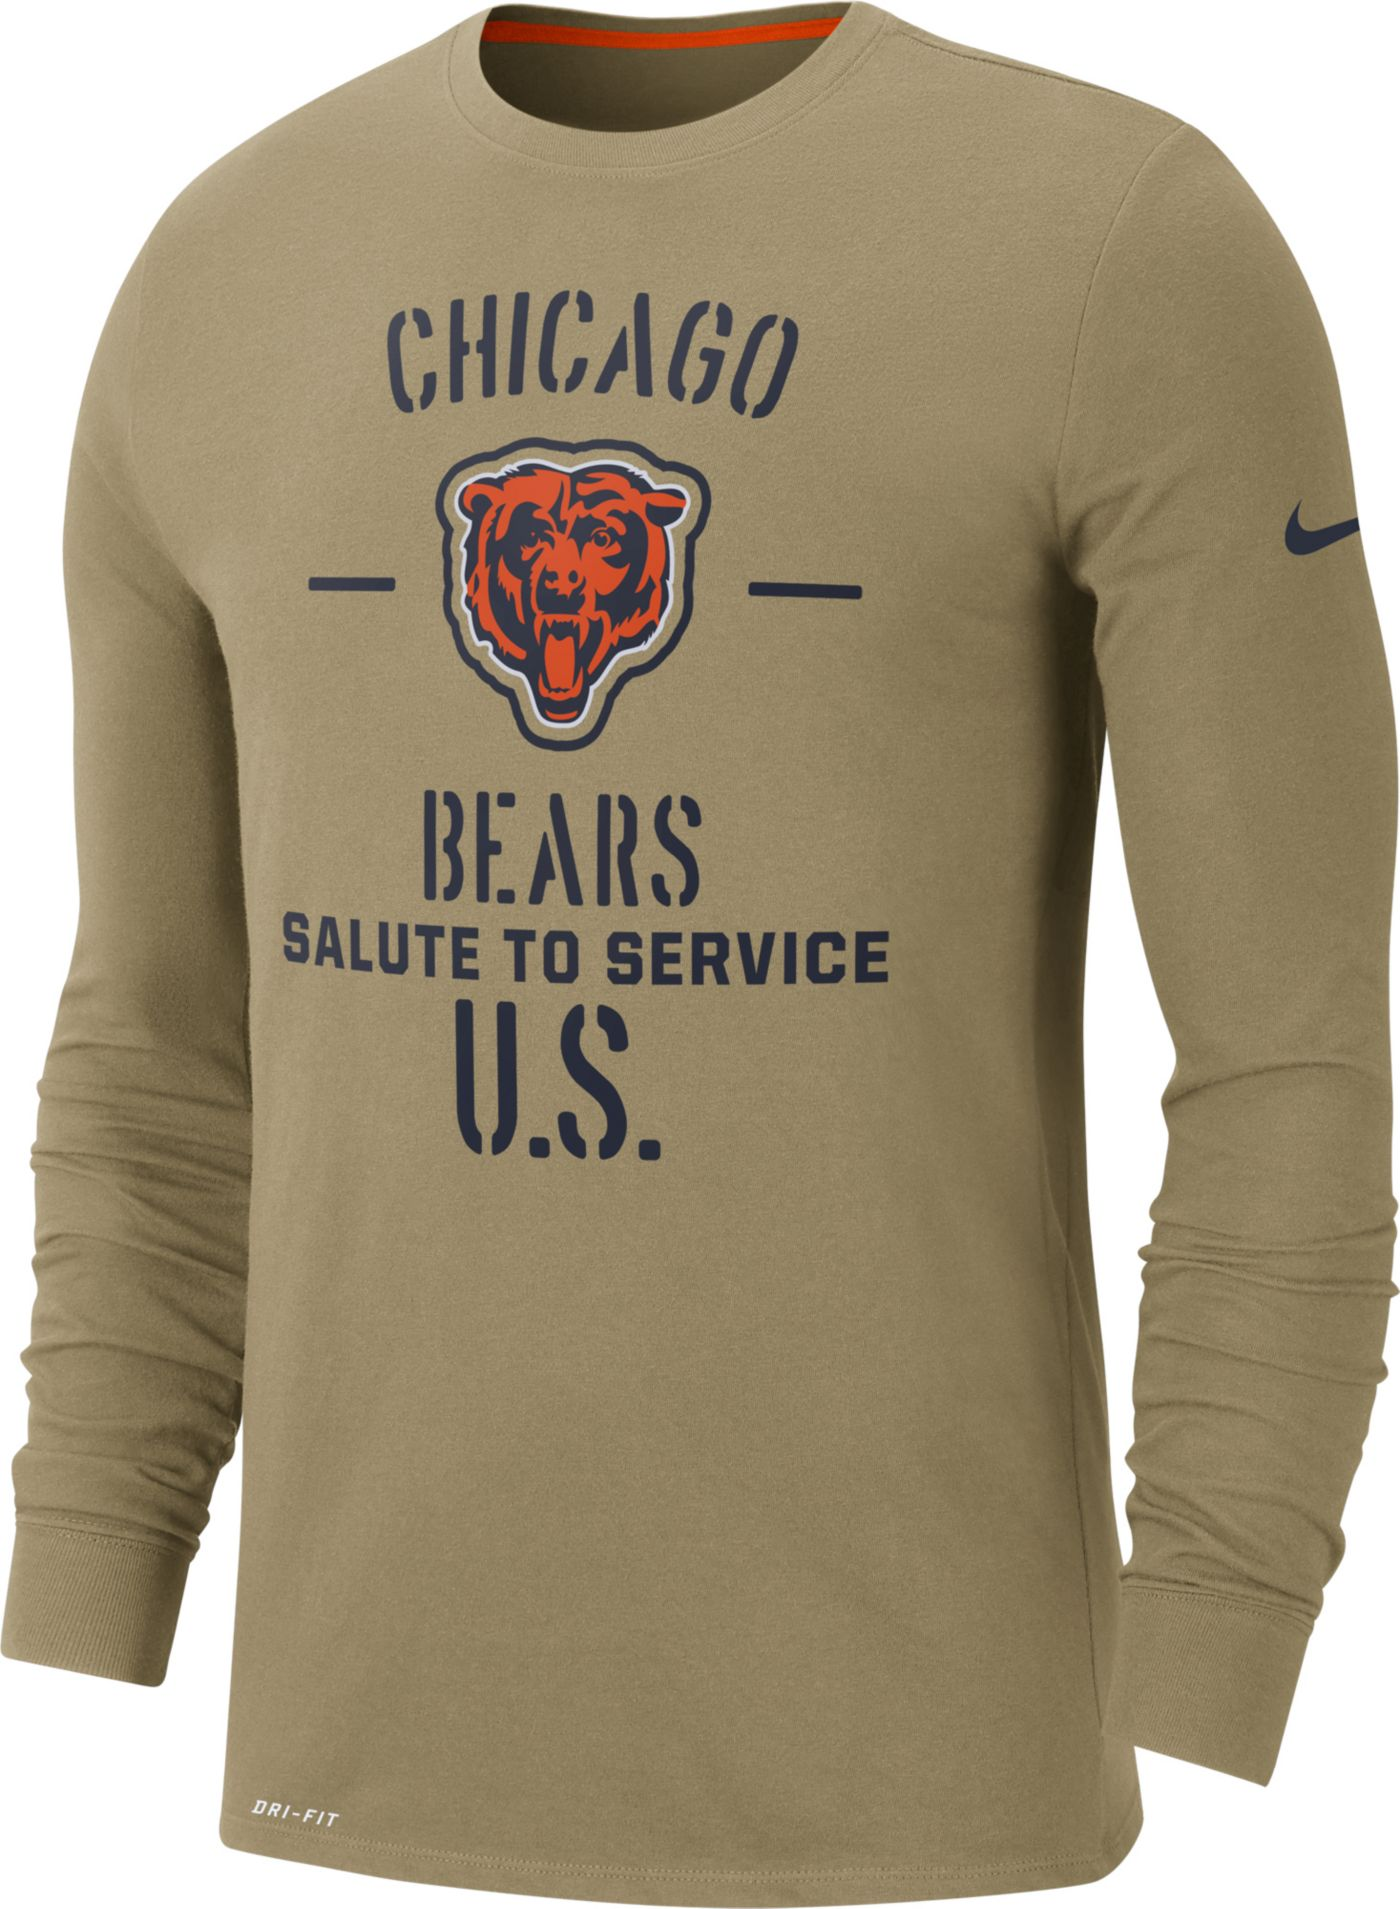 Nike Men's Salute to Service Chicago Bears Dri-FIT Beige Long Sleeve Shirt